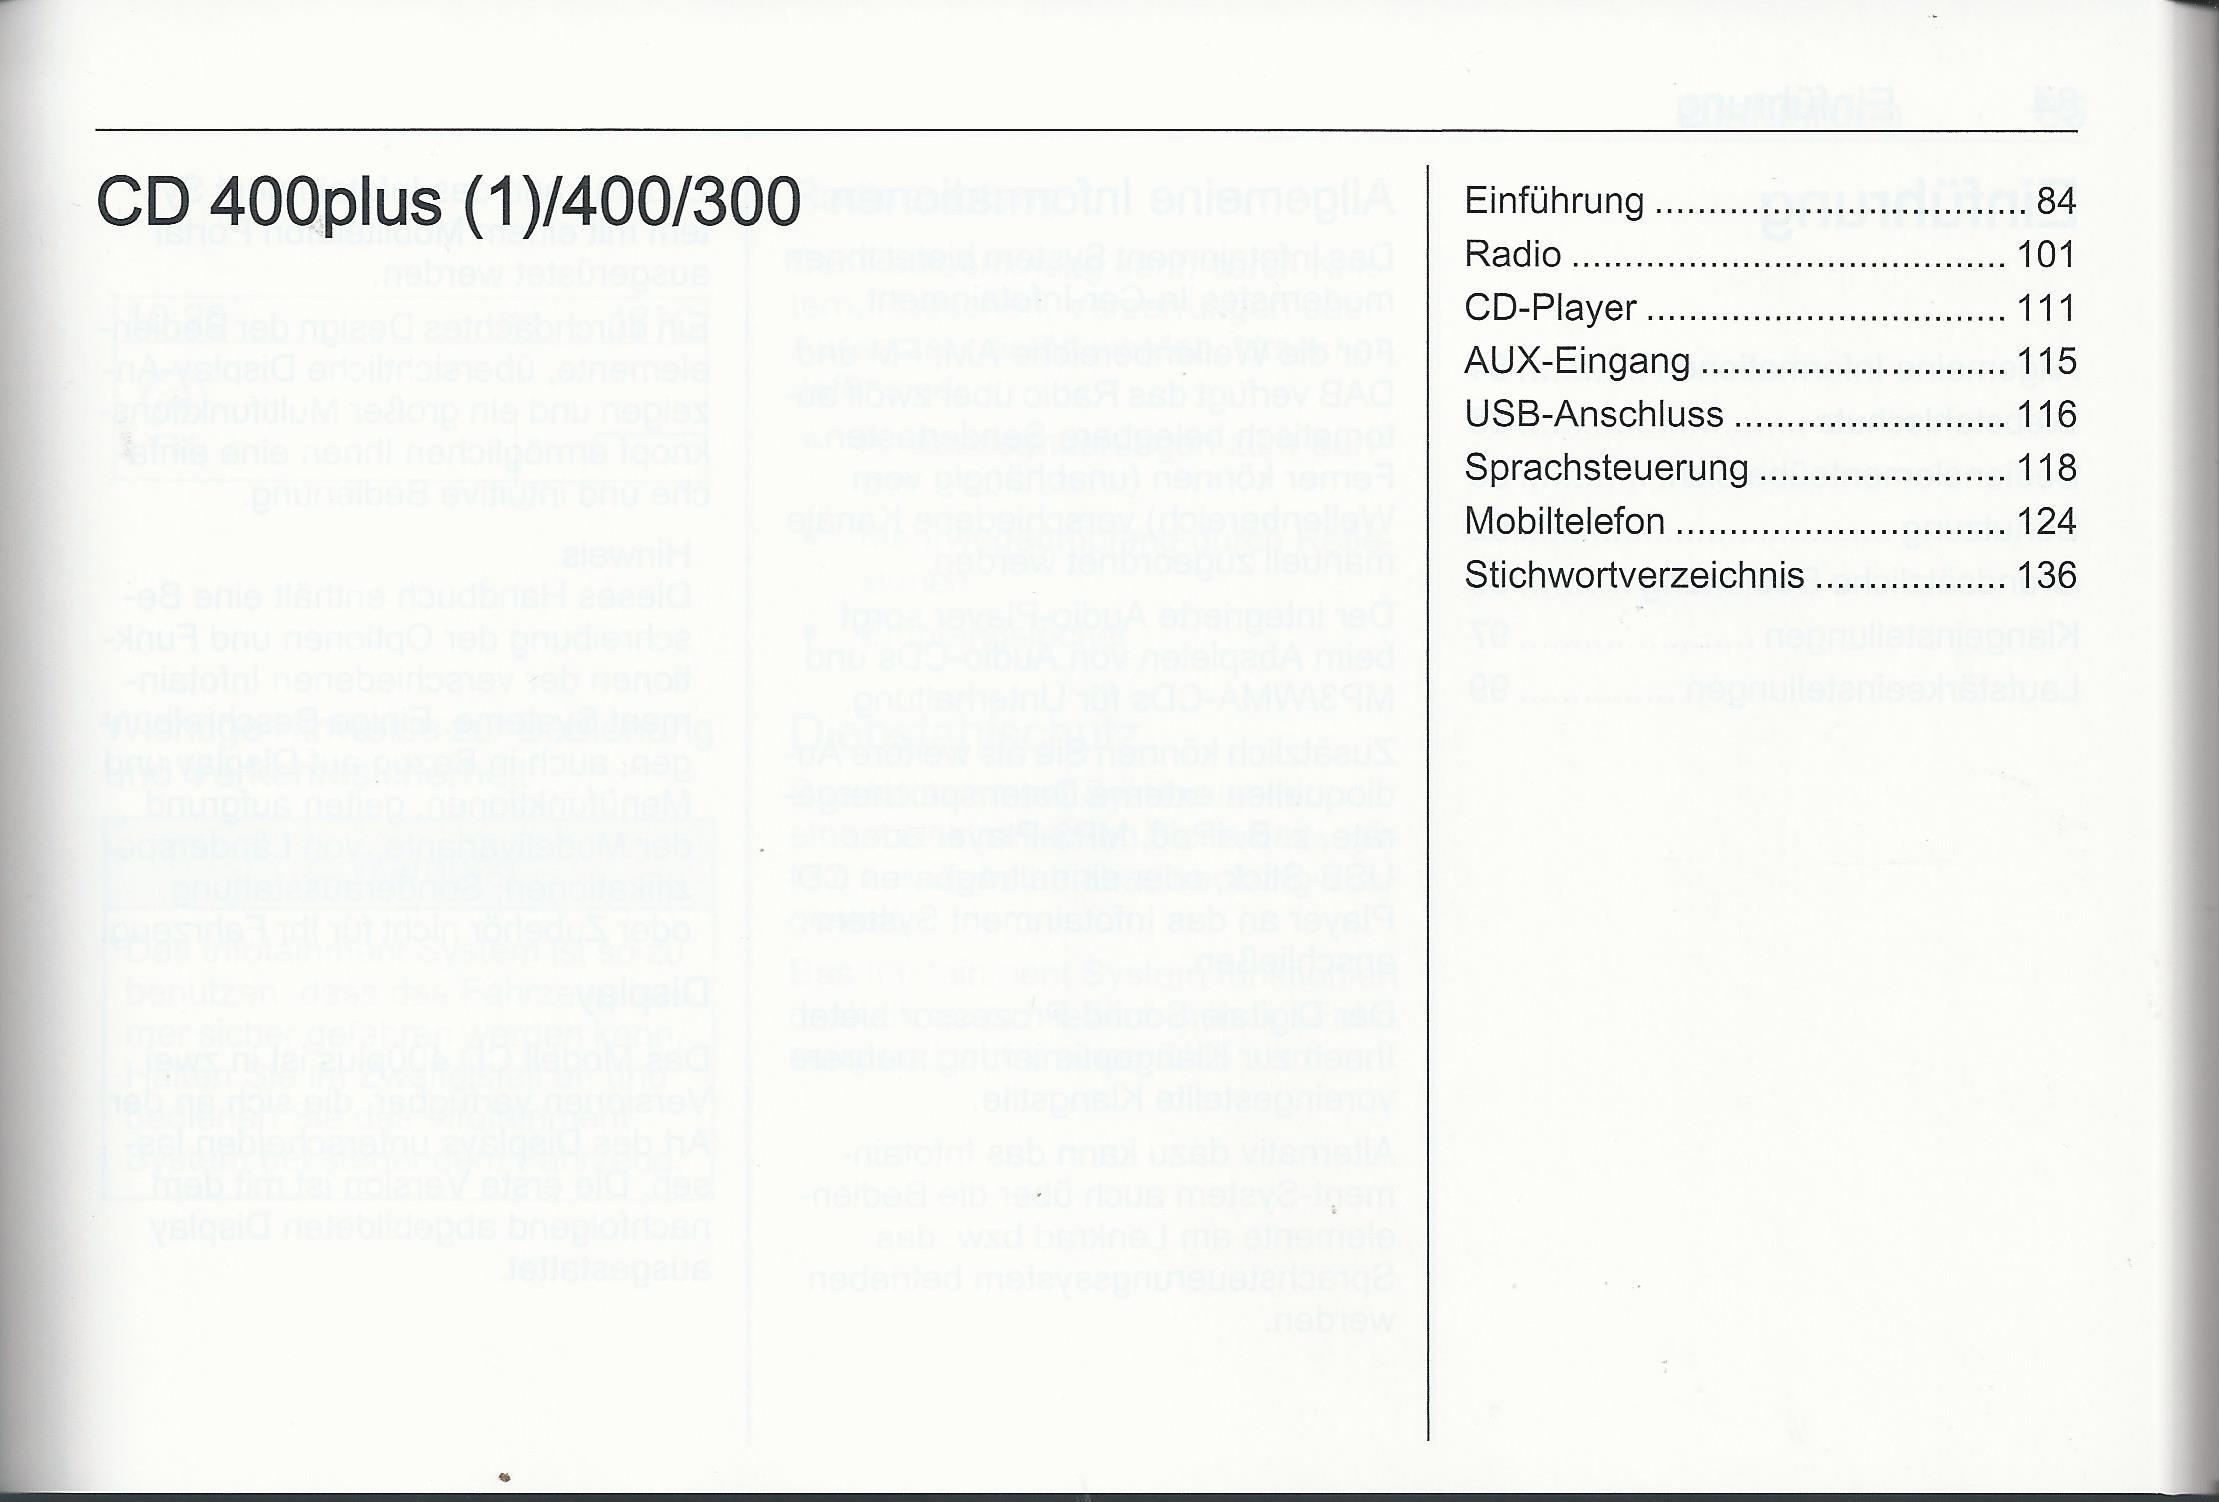 opel astra infotainment system 2015 betriebsanleitung bedienungsanleitung rn ebay. Black Bedroom Furniture Sets. Home Design Ideas